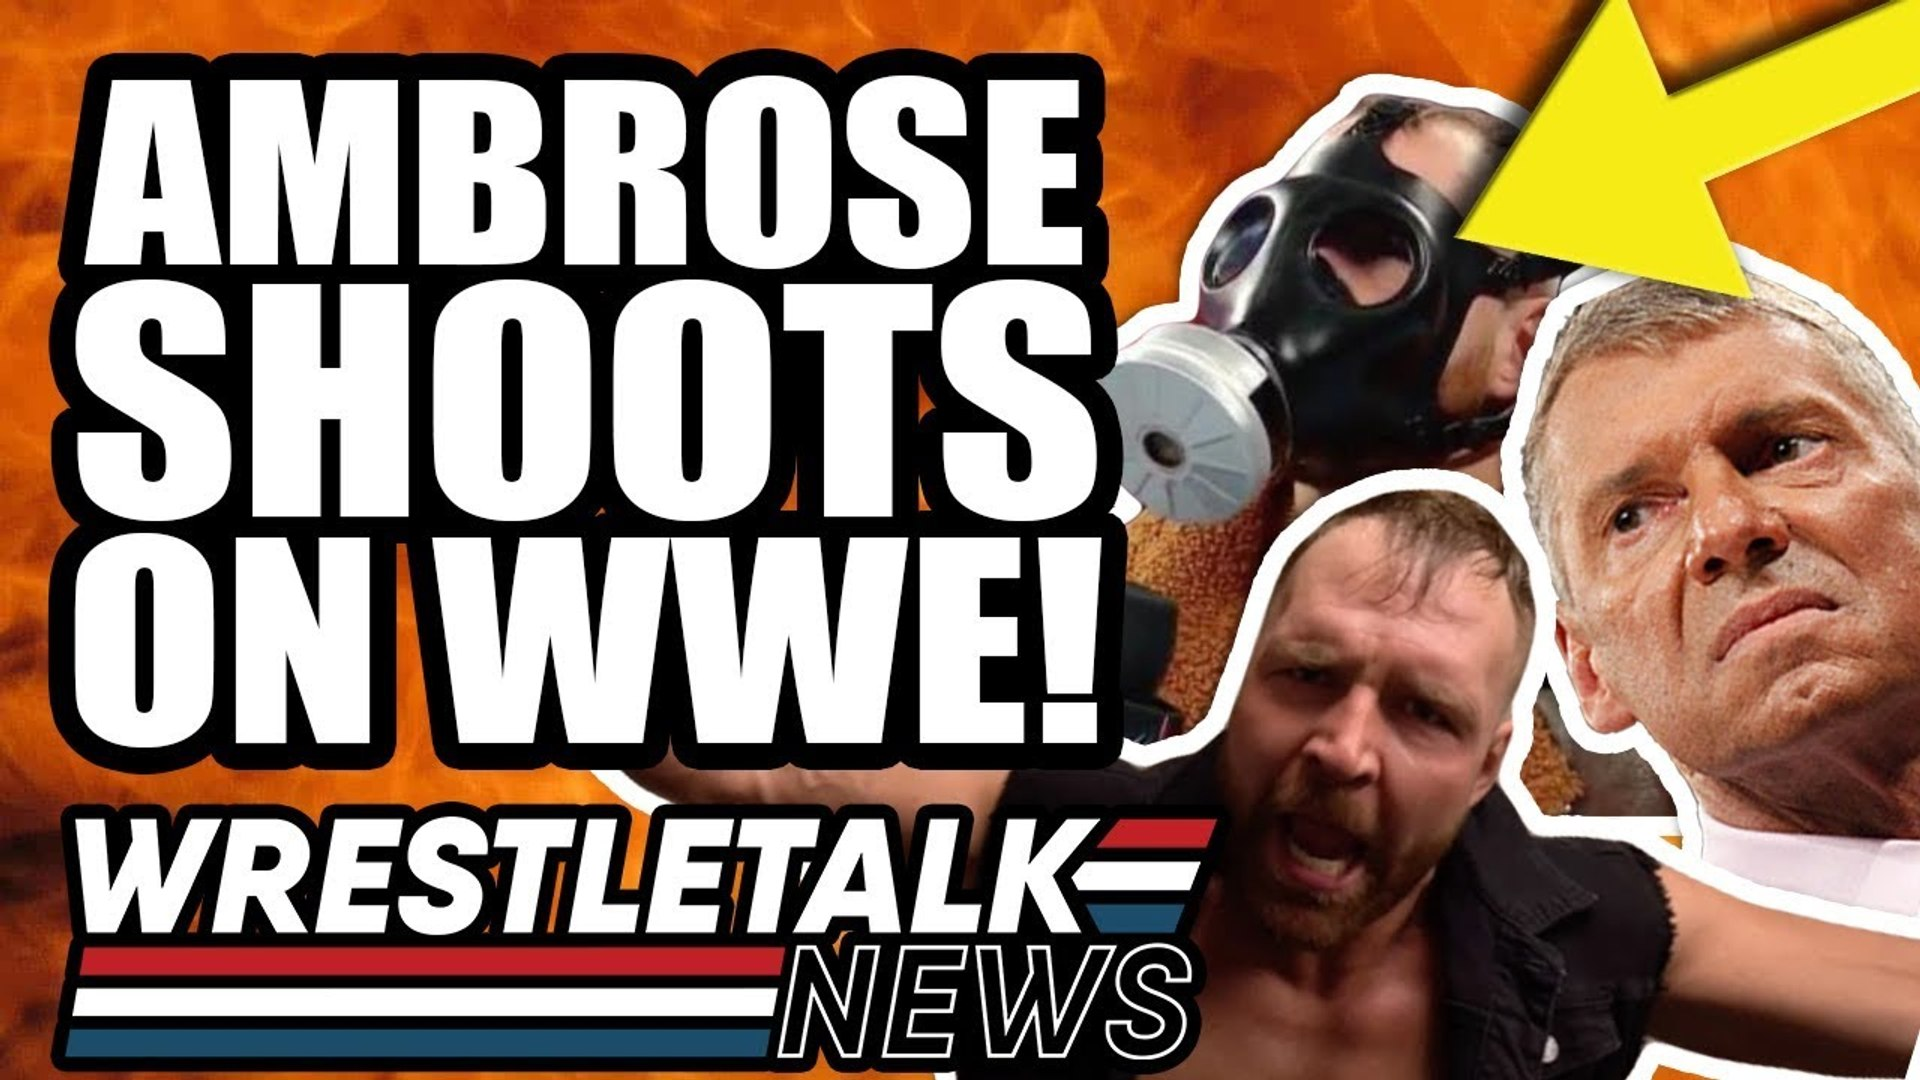 WWE BANS AEW Signs?! Dean Ambrose SHOOTS On WWE! | WrestleTalk News May 2019